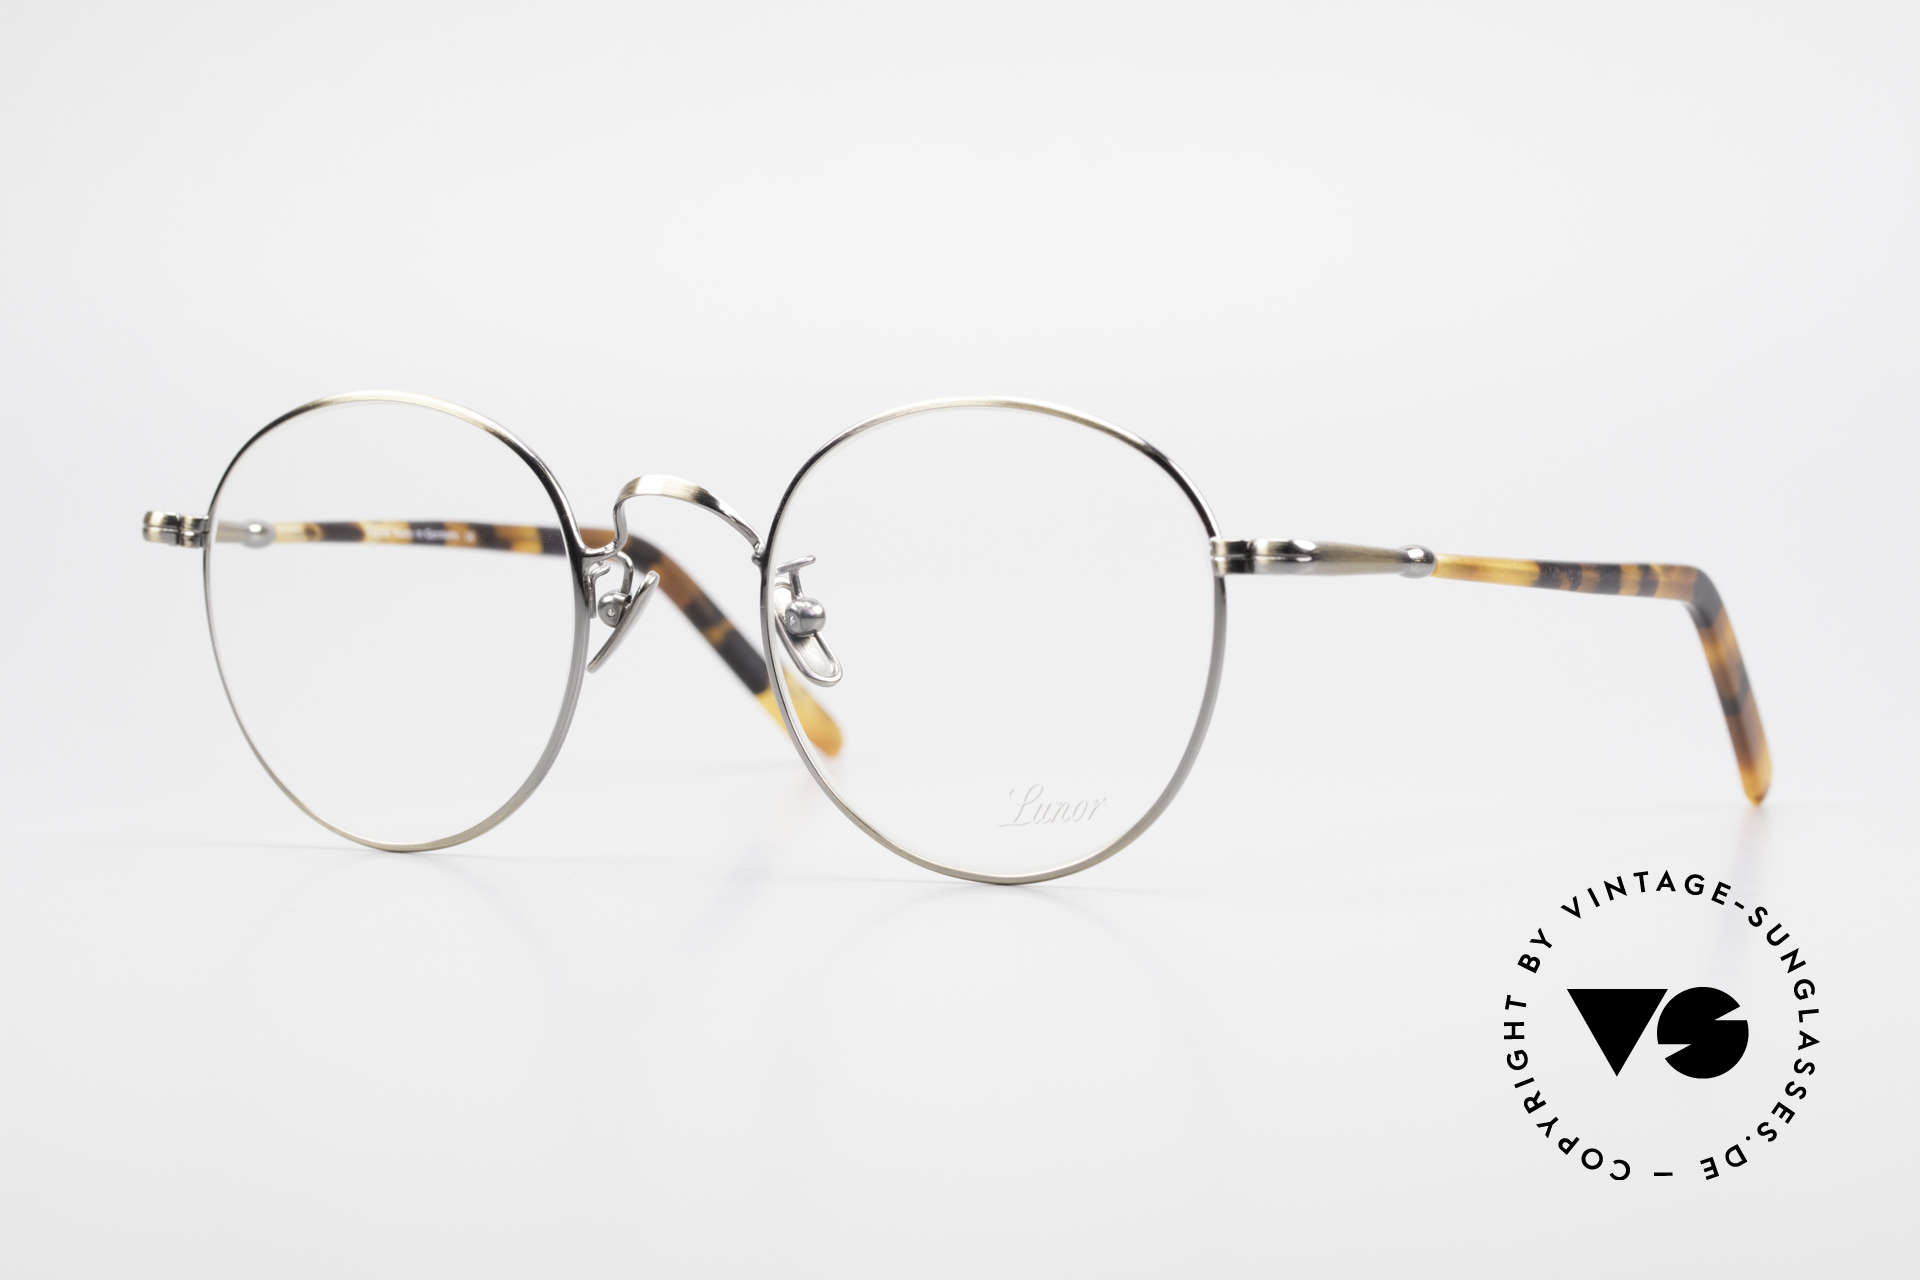 Lunor VA 111 Classy Men's Panto Eyeglasses, LUNOR: honest craftsmanship with attention to details, Made for Men